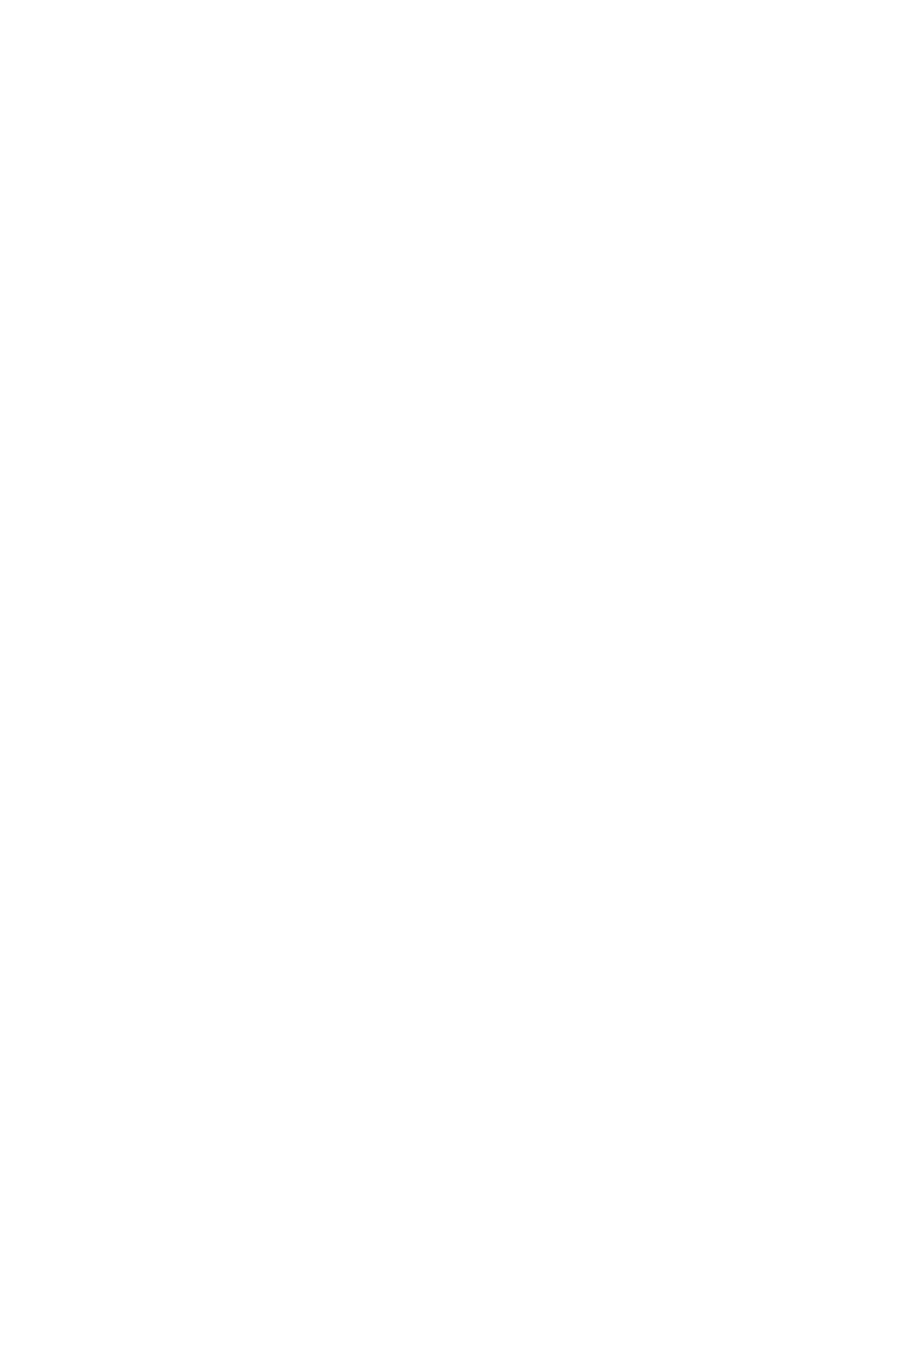 Crystallize logo